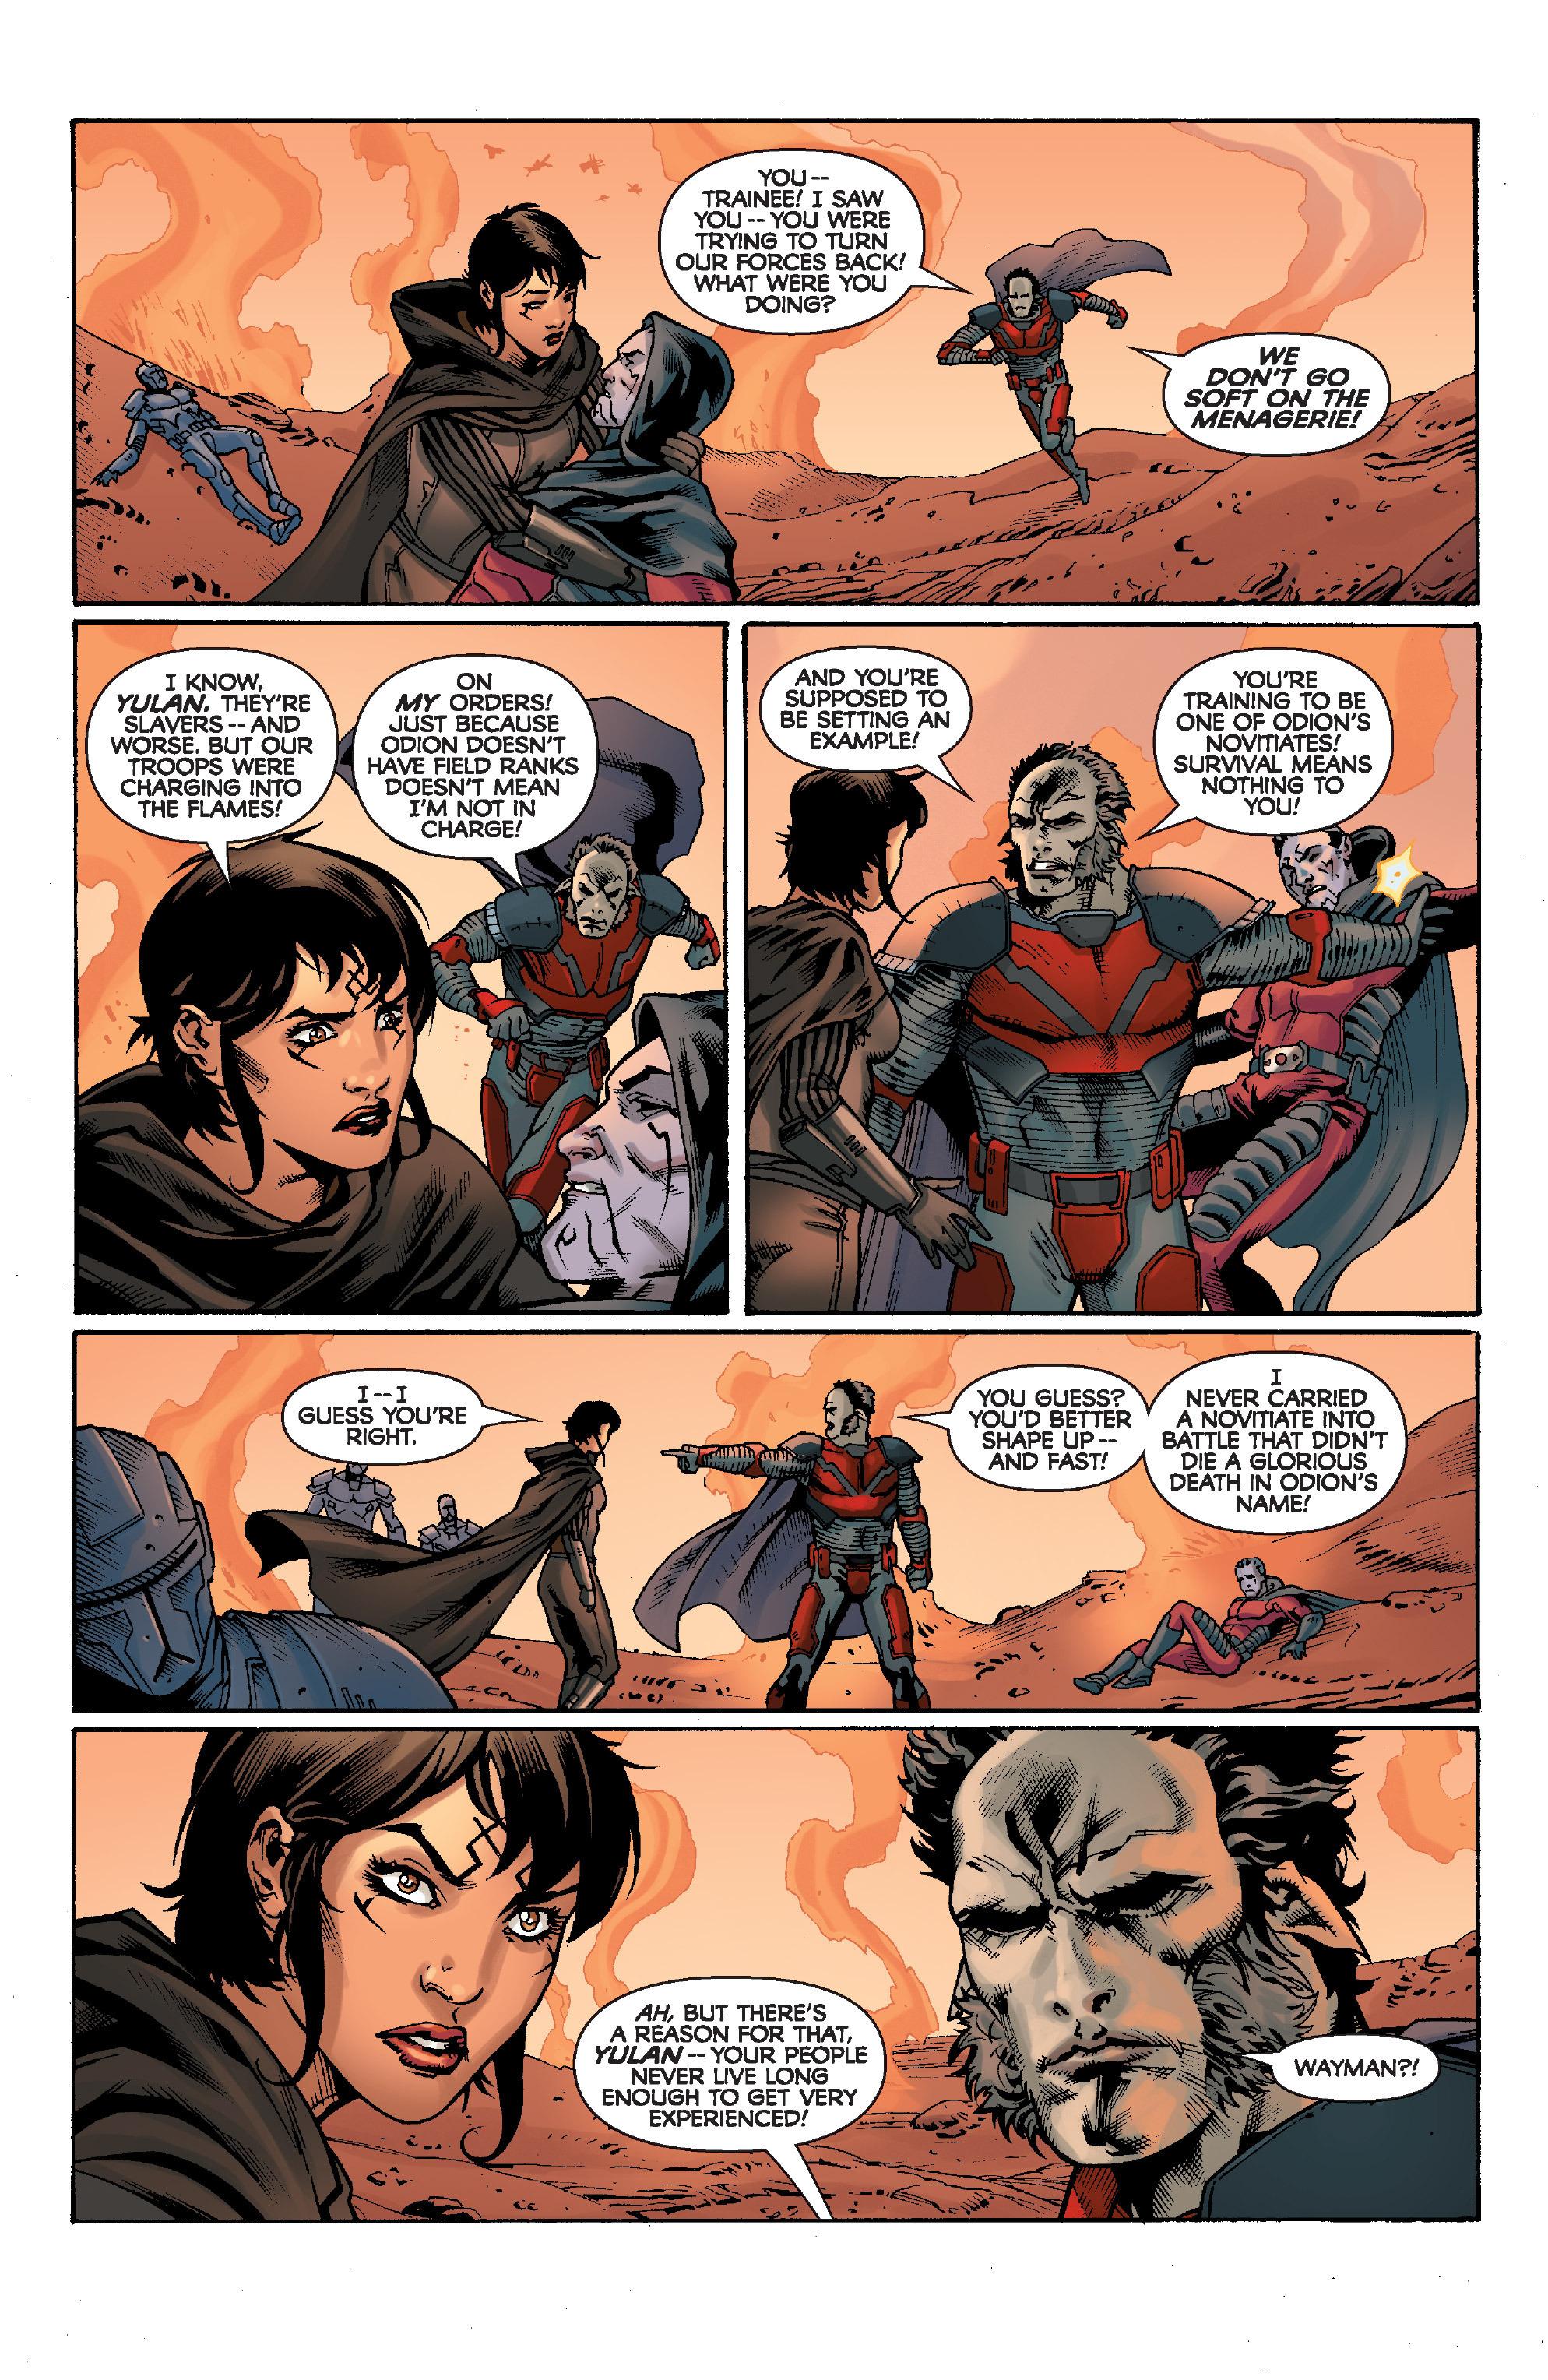 Read online Star Wars: Knight Errant - Escape comic -  Issue #1 - 14